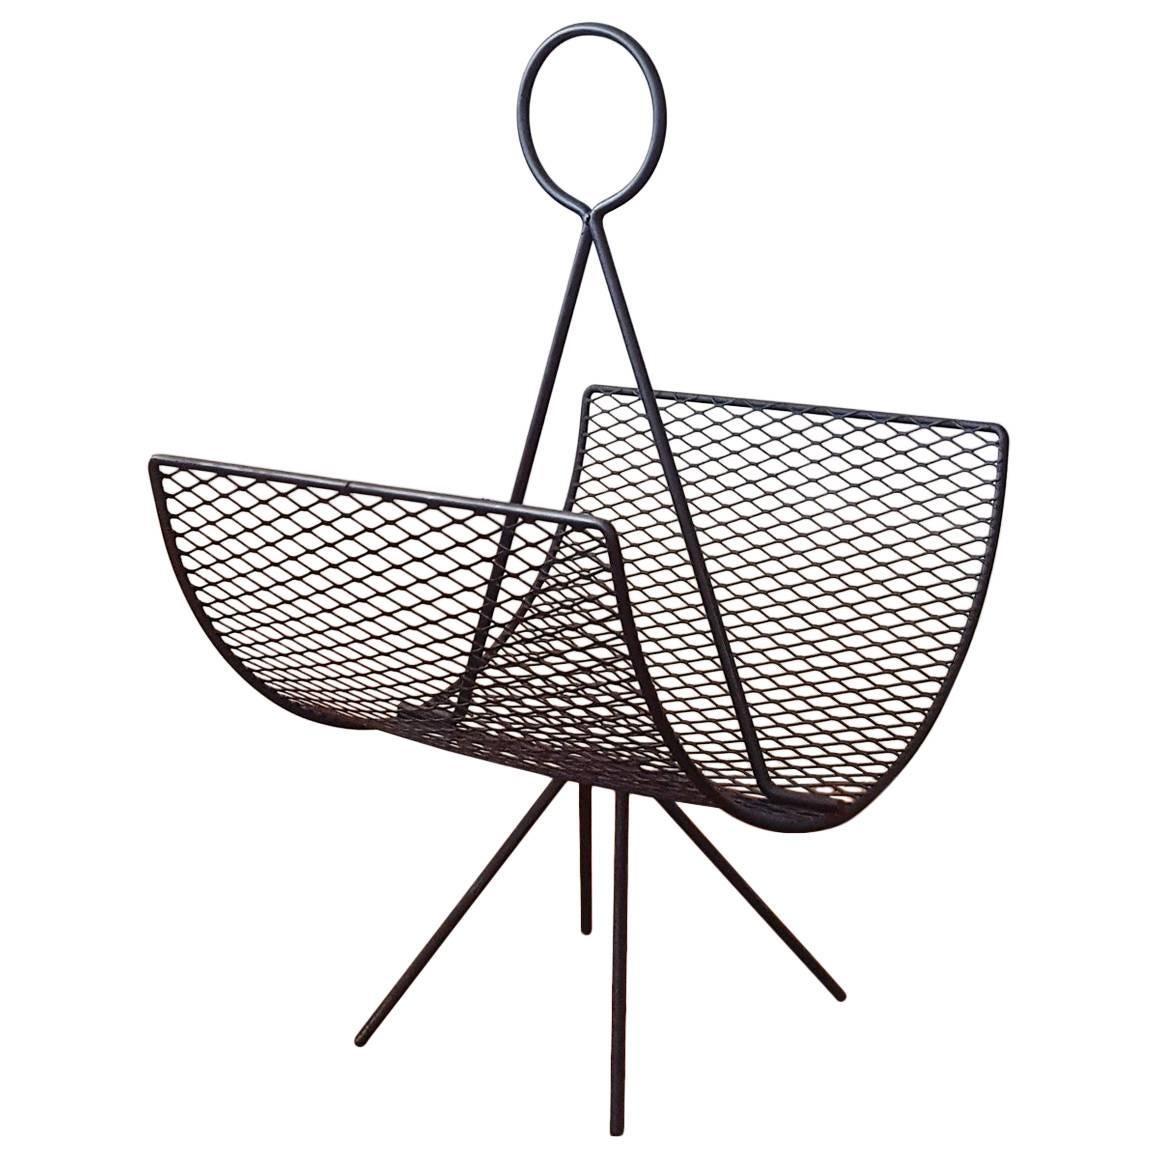 string chair by robert j ellenberger for calfab good design 1950s  string chair by robert j ellenberger for calfab good design 1950s for sale at 1stdibs